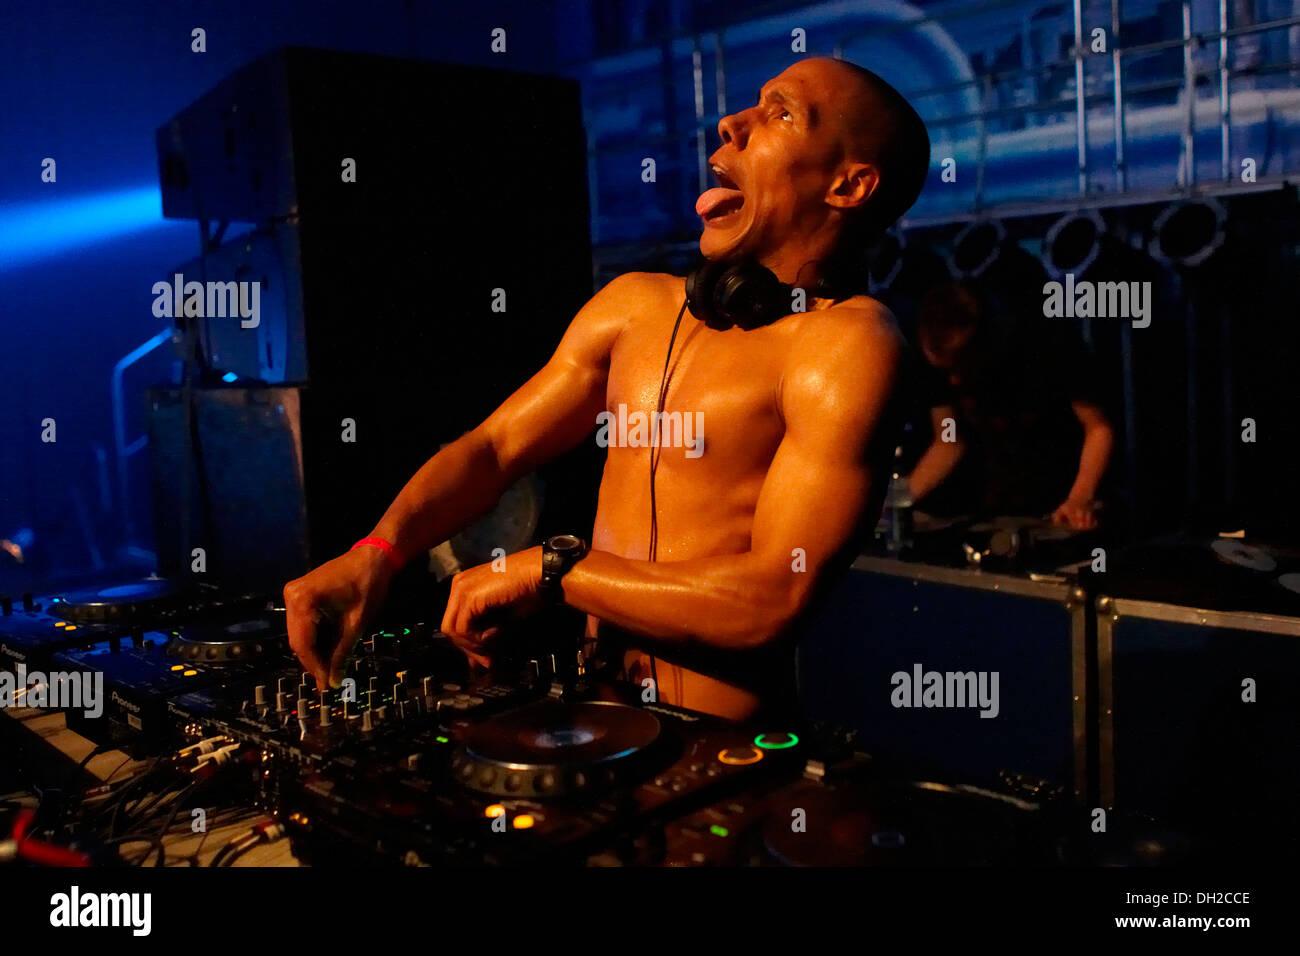 Showtek techno DJ, festival Mayday 2010 dans la salle de concert, Westfalenhalle Dortmund, Rhénanie du Nord-Westphalie Photo Stock